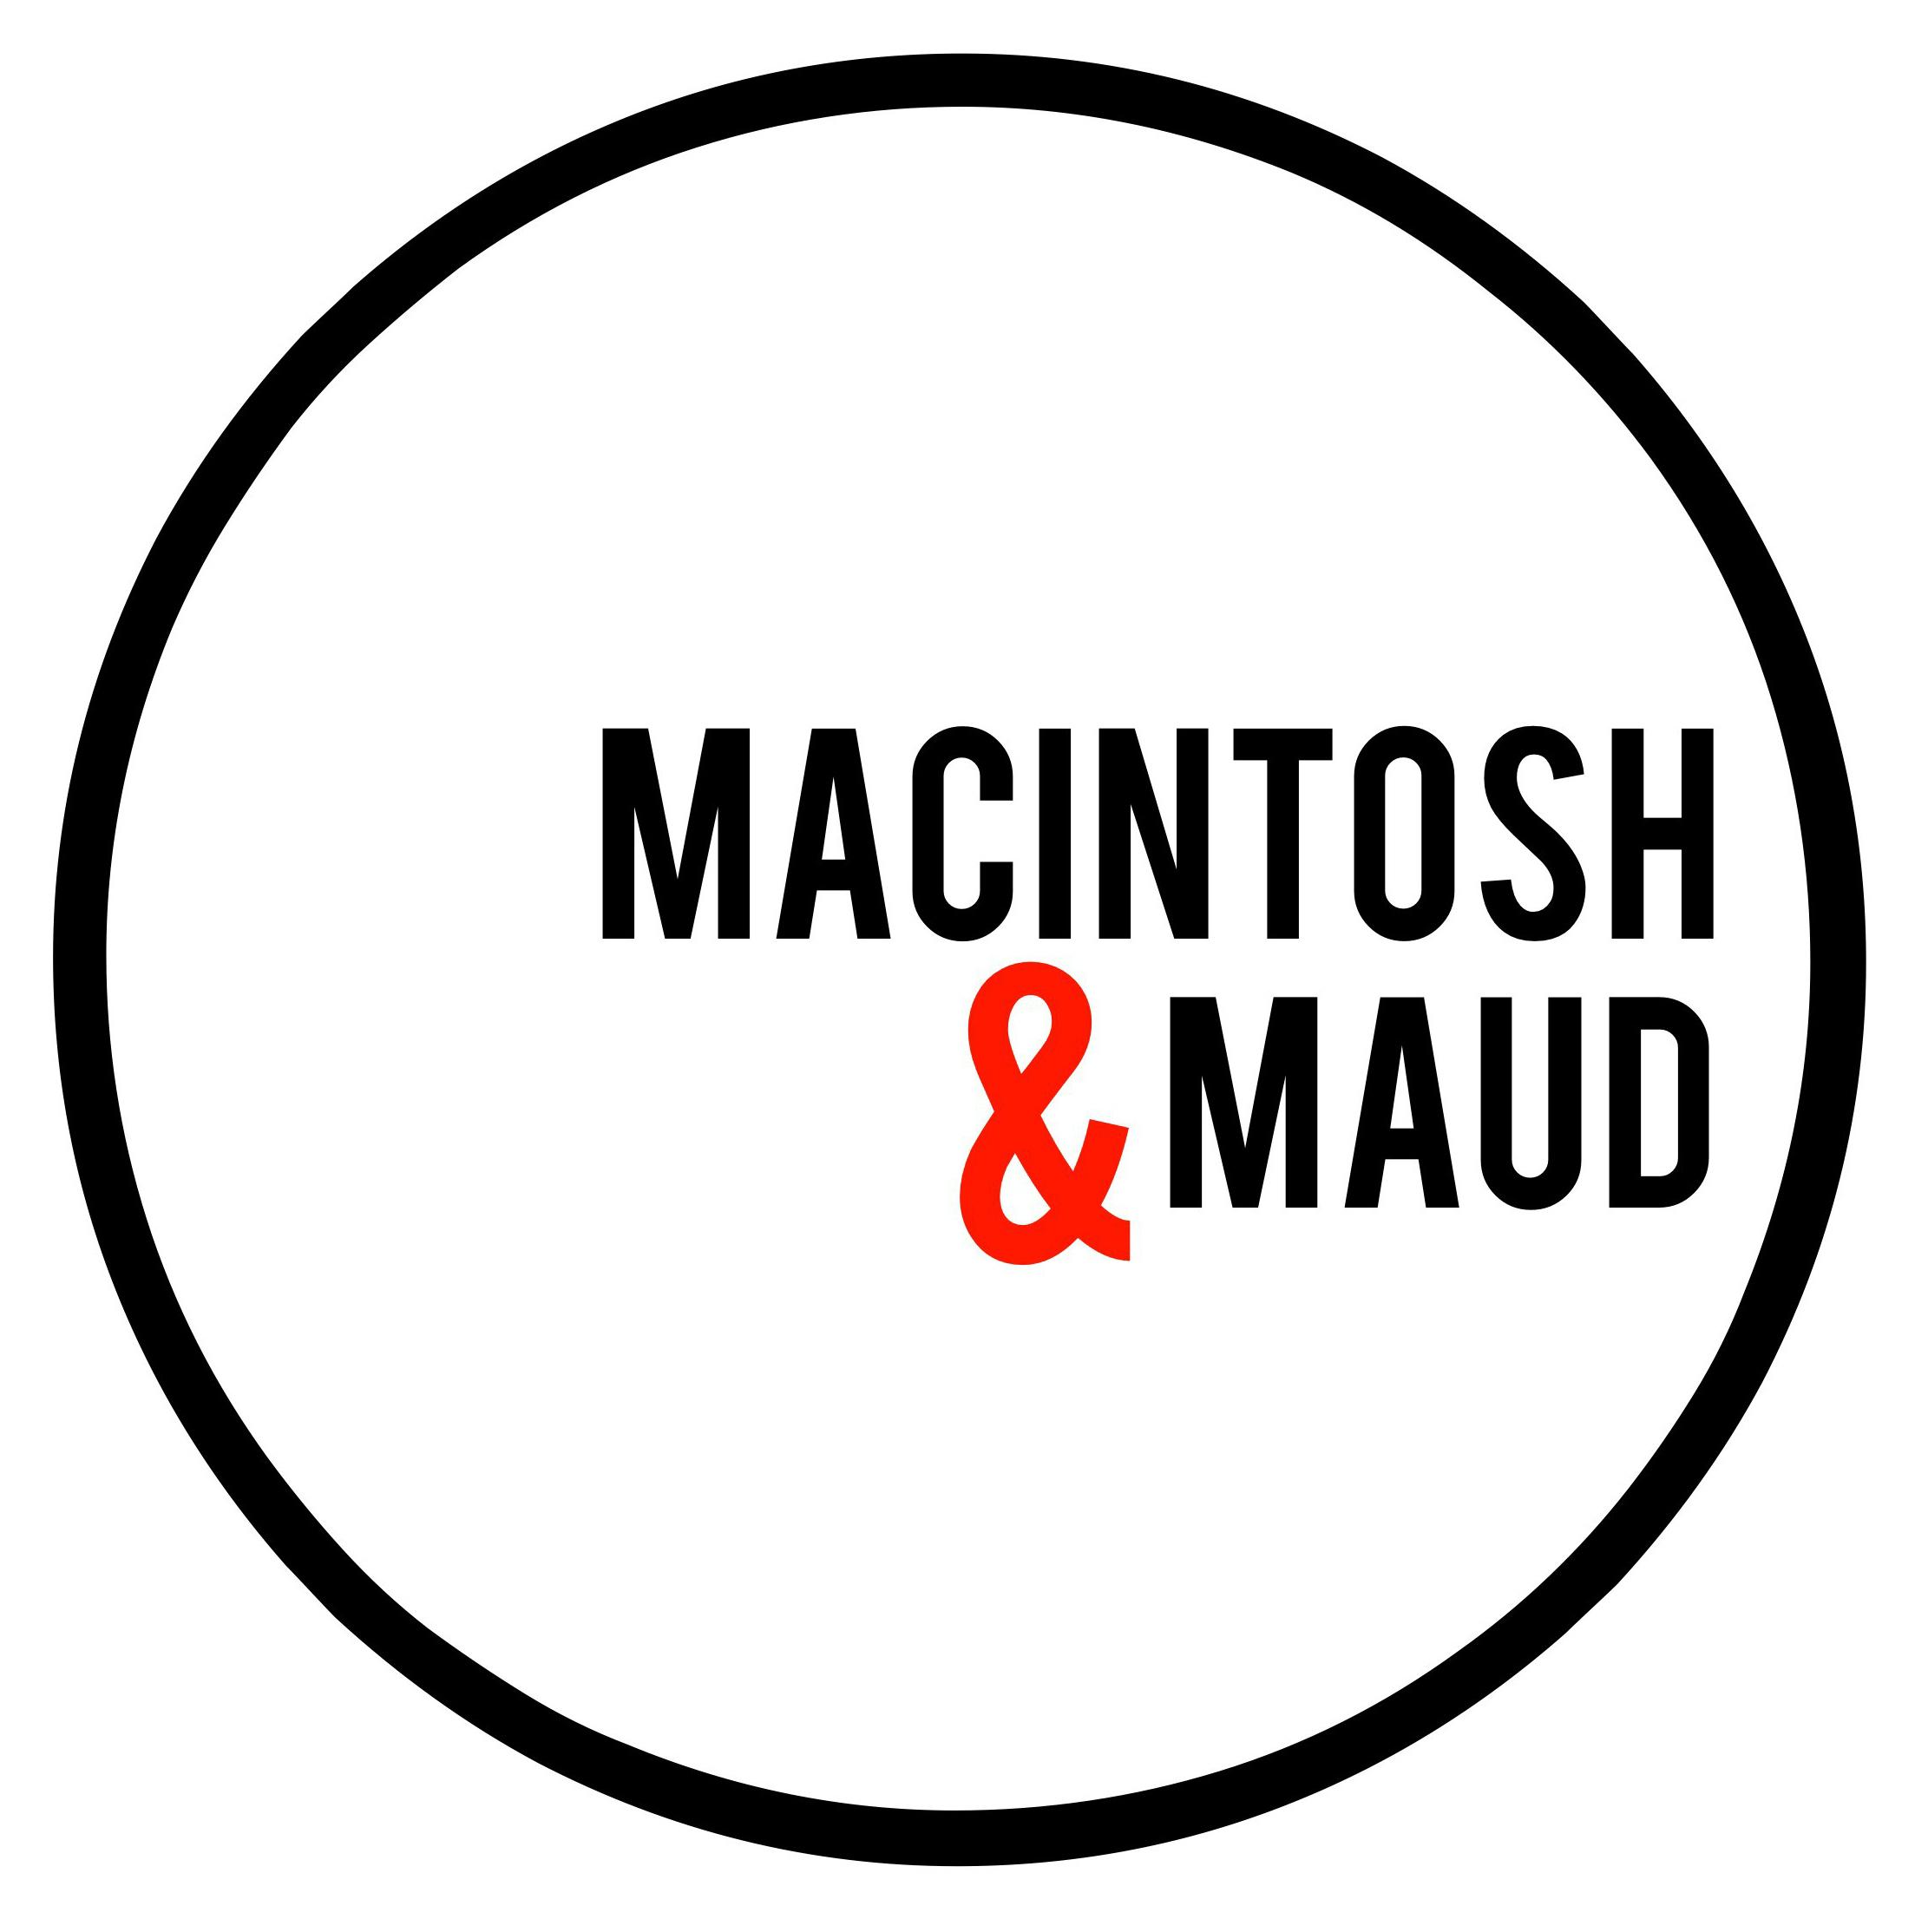 MM Logo 6.30.18 Squared Off.jpg